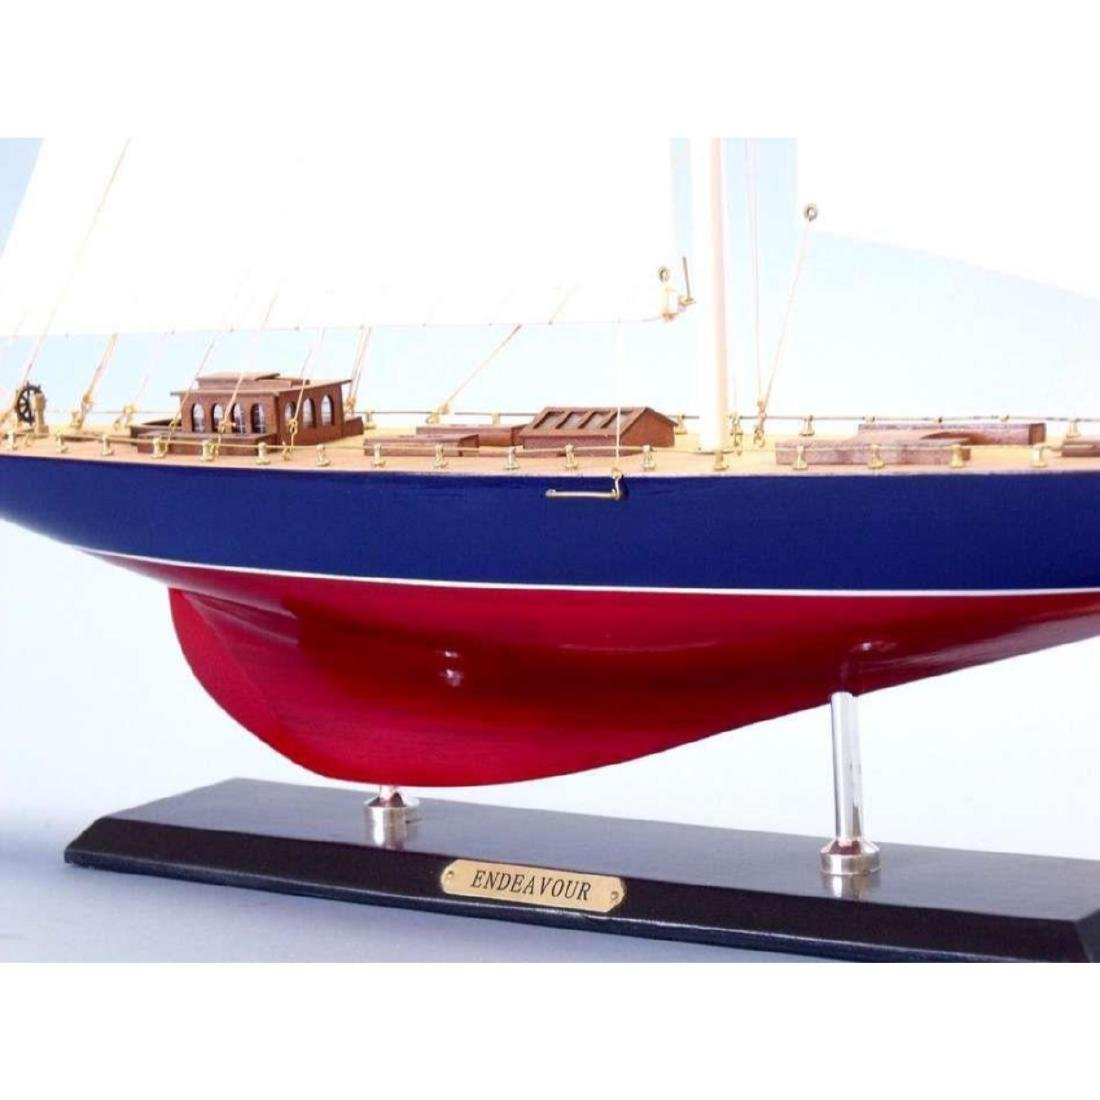 "Wooden Endeavour Limited Model Sailboat Decoration 35"" - 8"